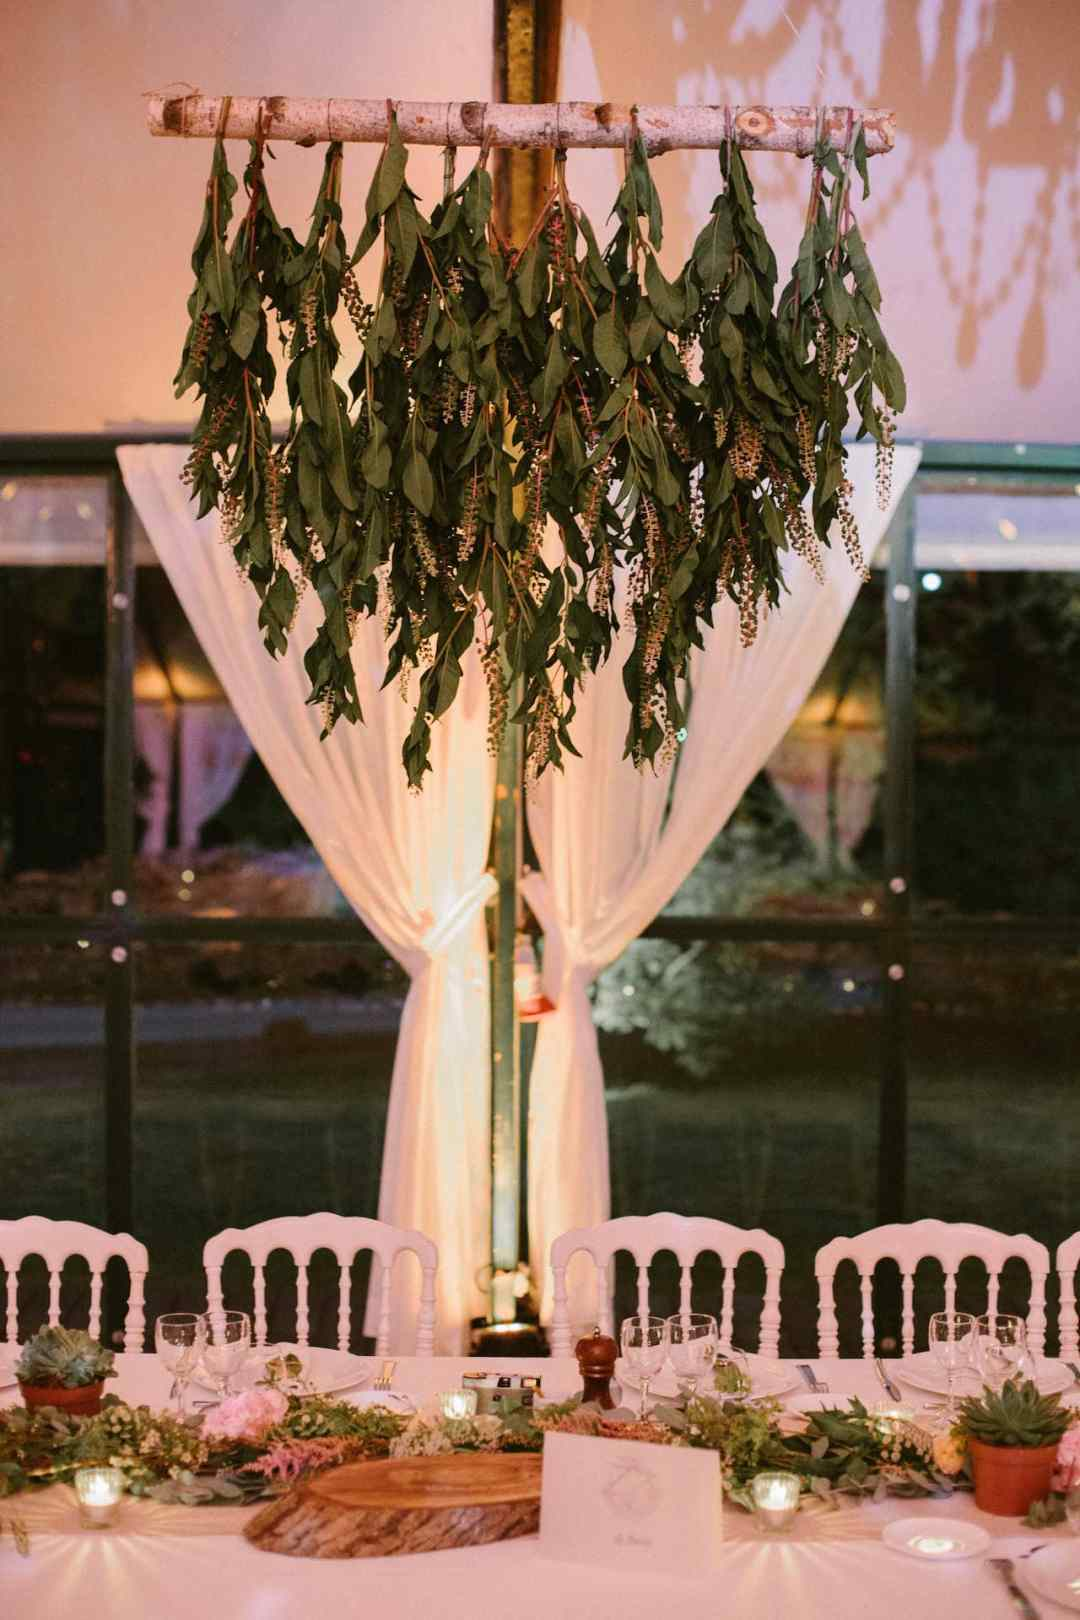 suspension-feuillage-table-honneur-mariage